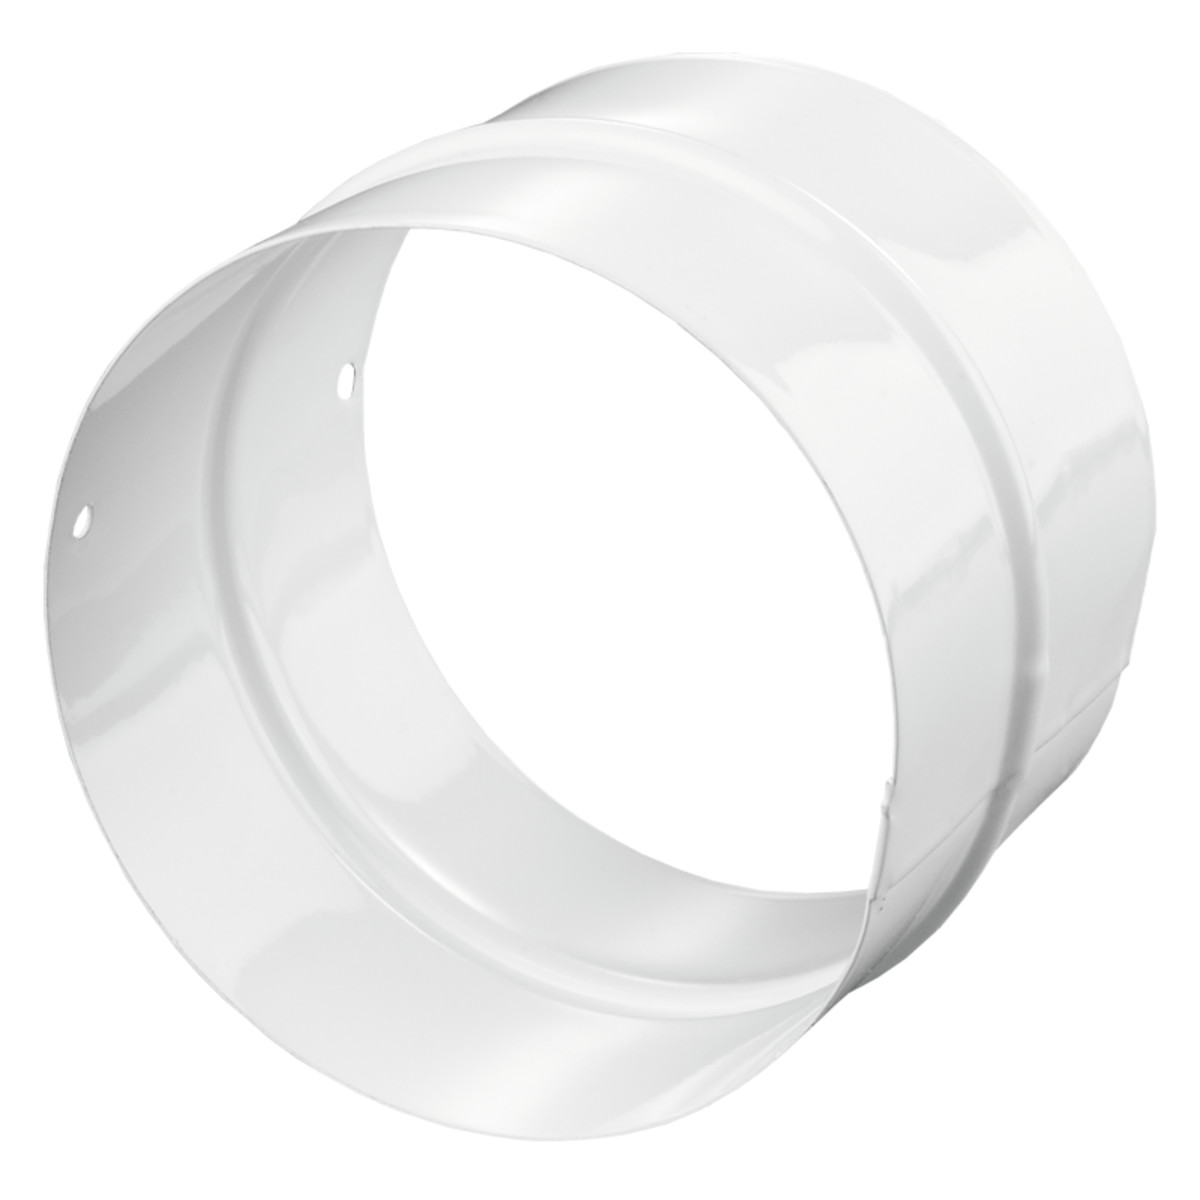 Переходник Вентс ПМ-100Ц Ø100 мм металл